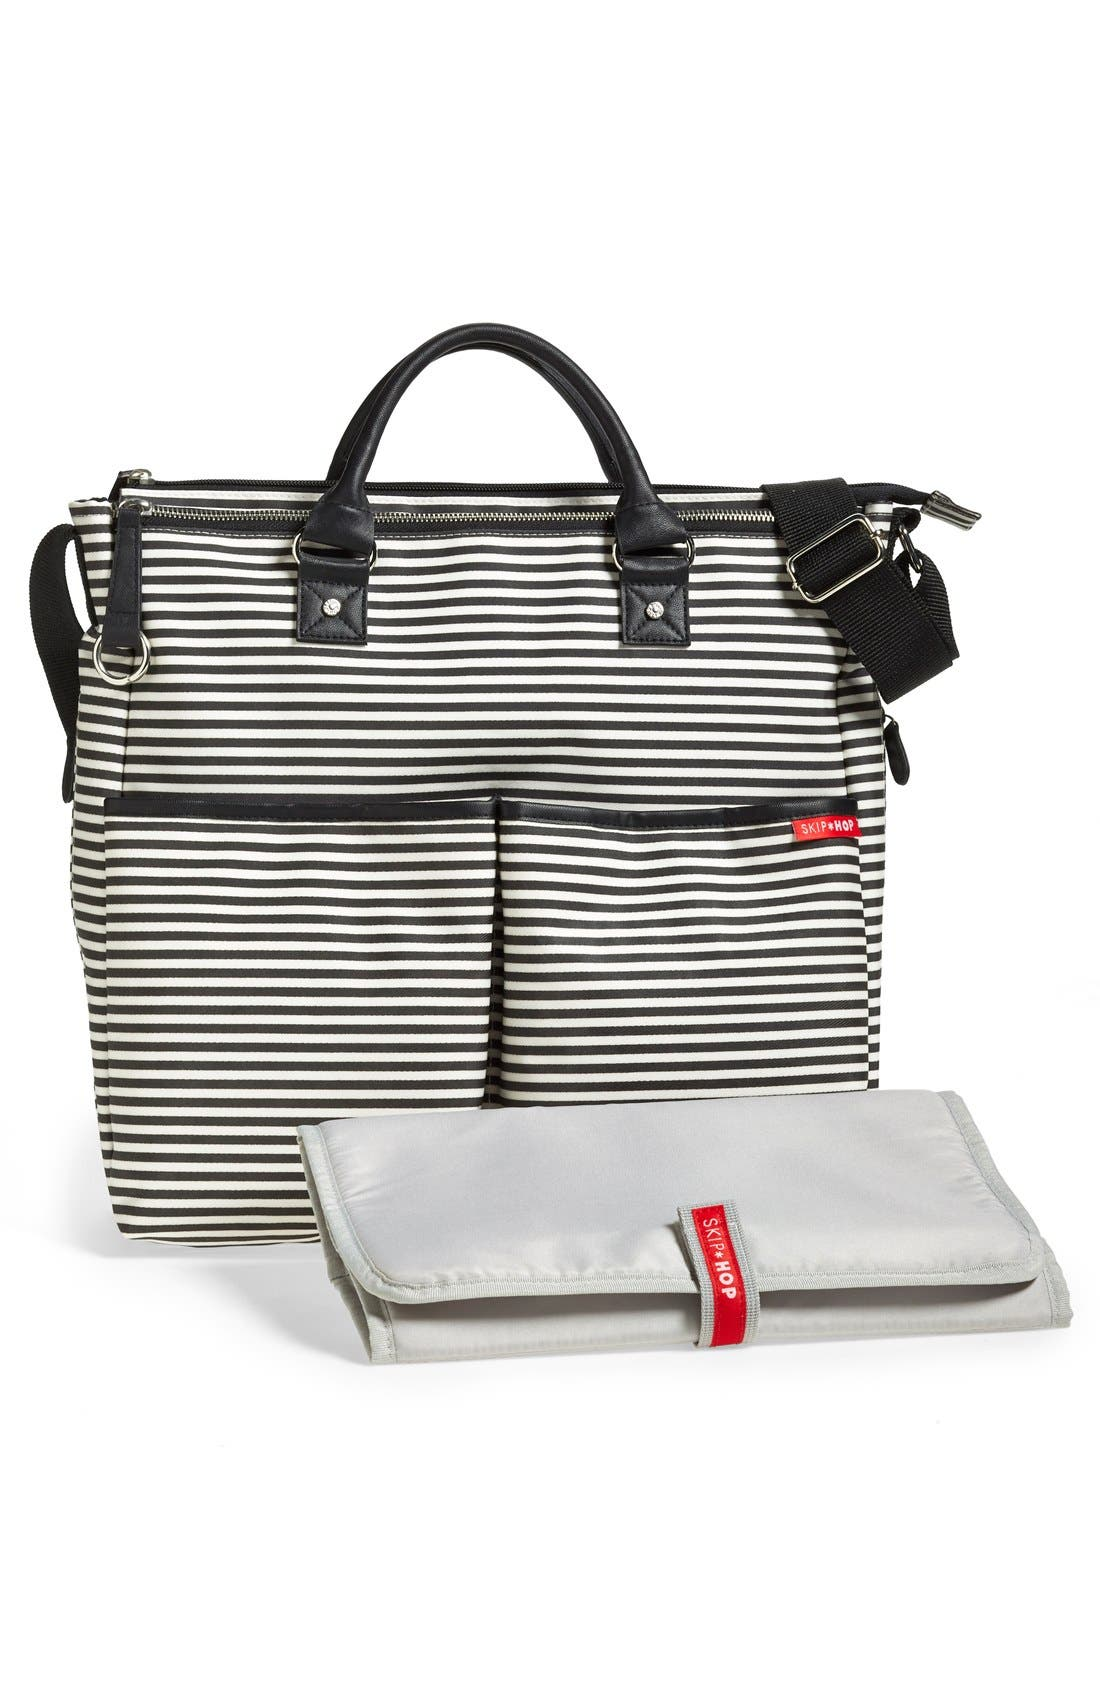 Main Image - Skip Hop 'Duo - Special Edition' Diaper Bag